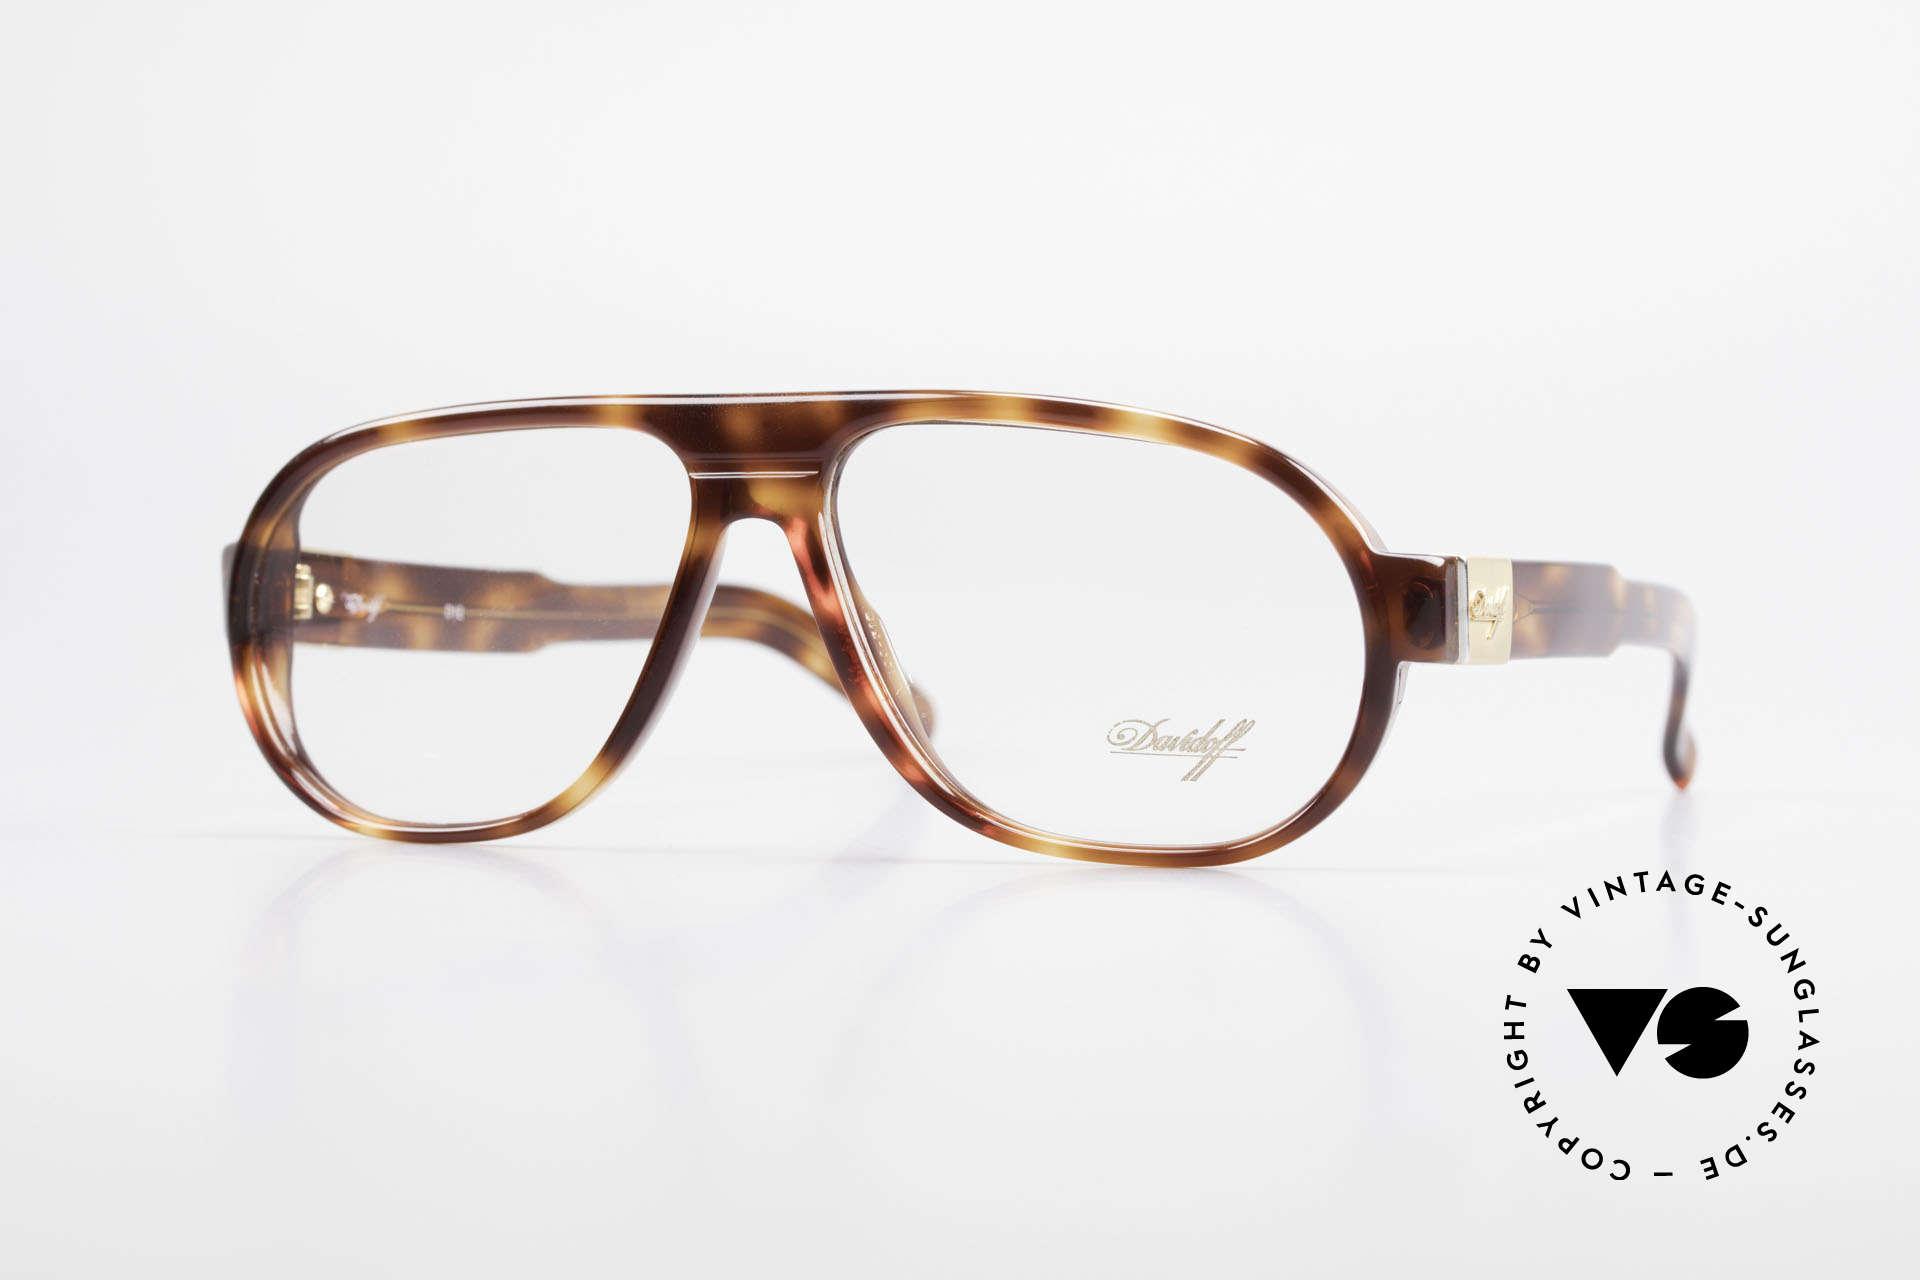 Davidoff 100 90's Men's Vintage Frame, rare and very NOBLE eyeglasses-frame by DAVIDOFF, Made for Men